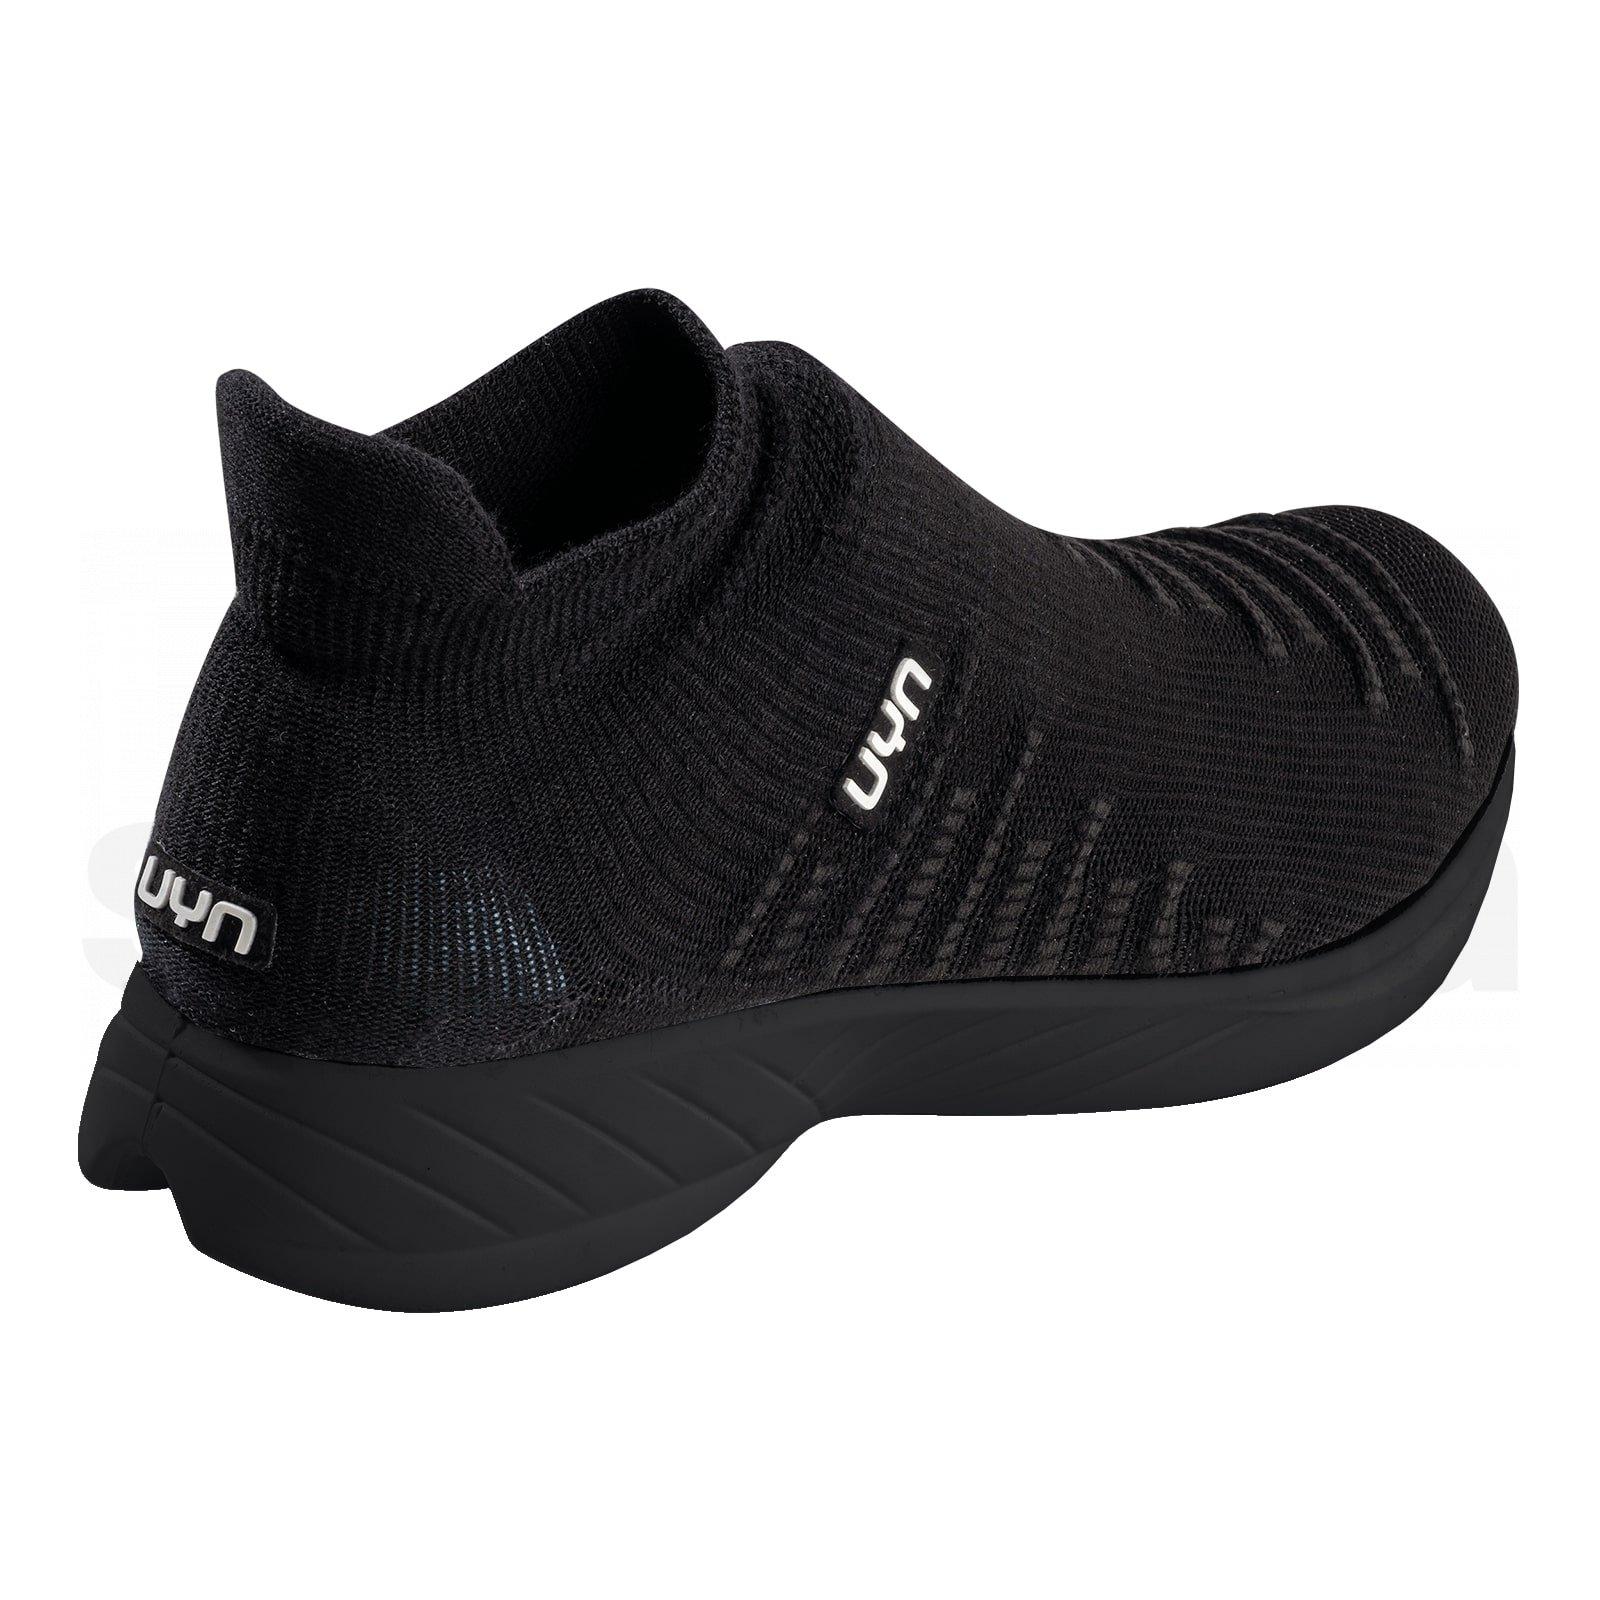 Obuv UYN X-Cross Shoes Black Sole W - černá